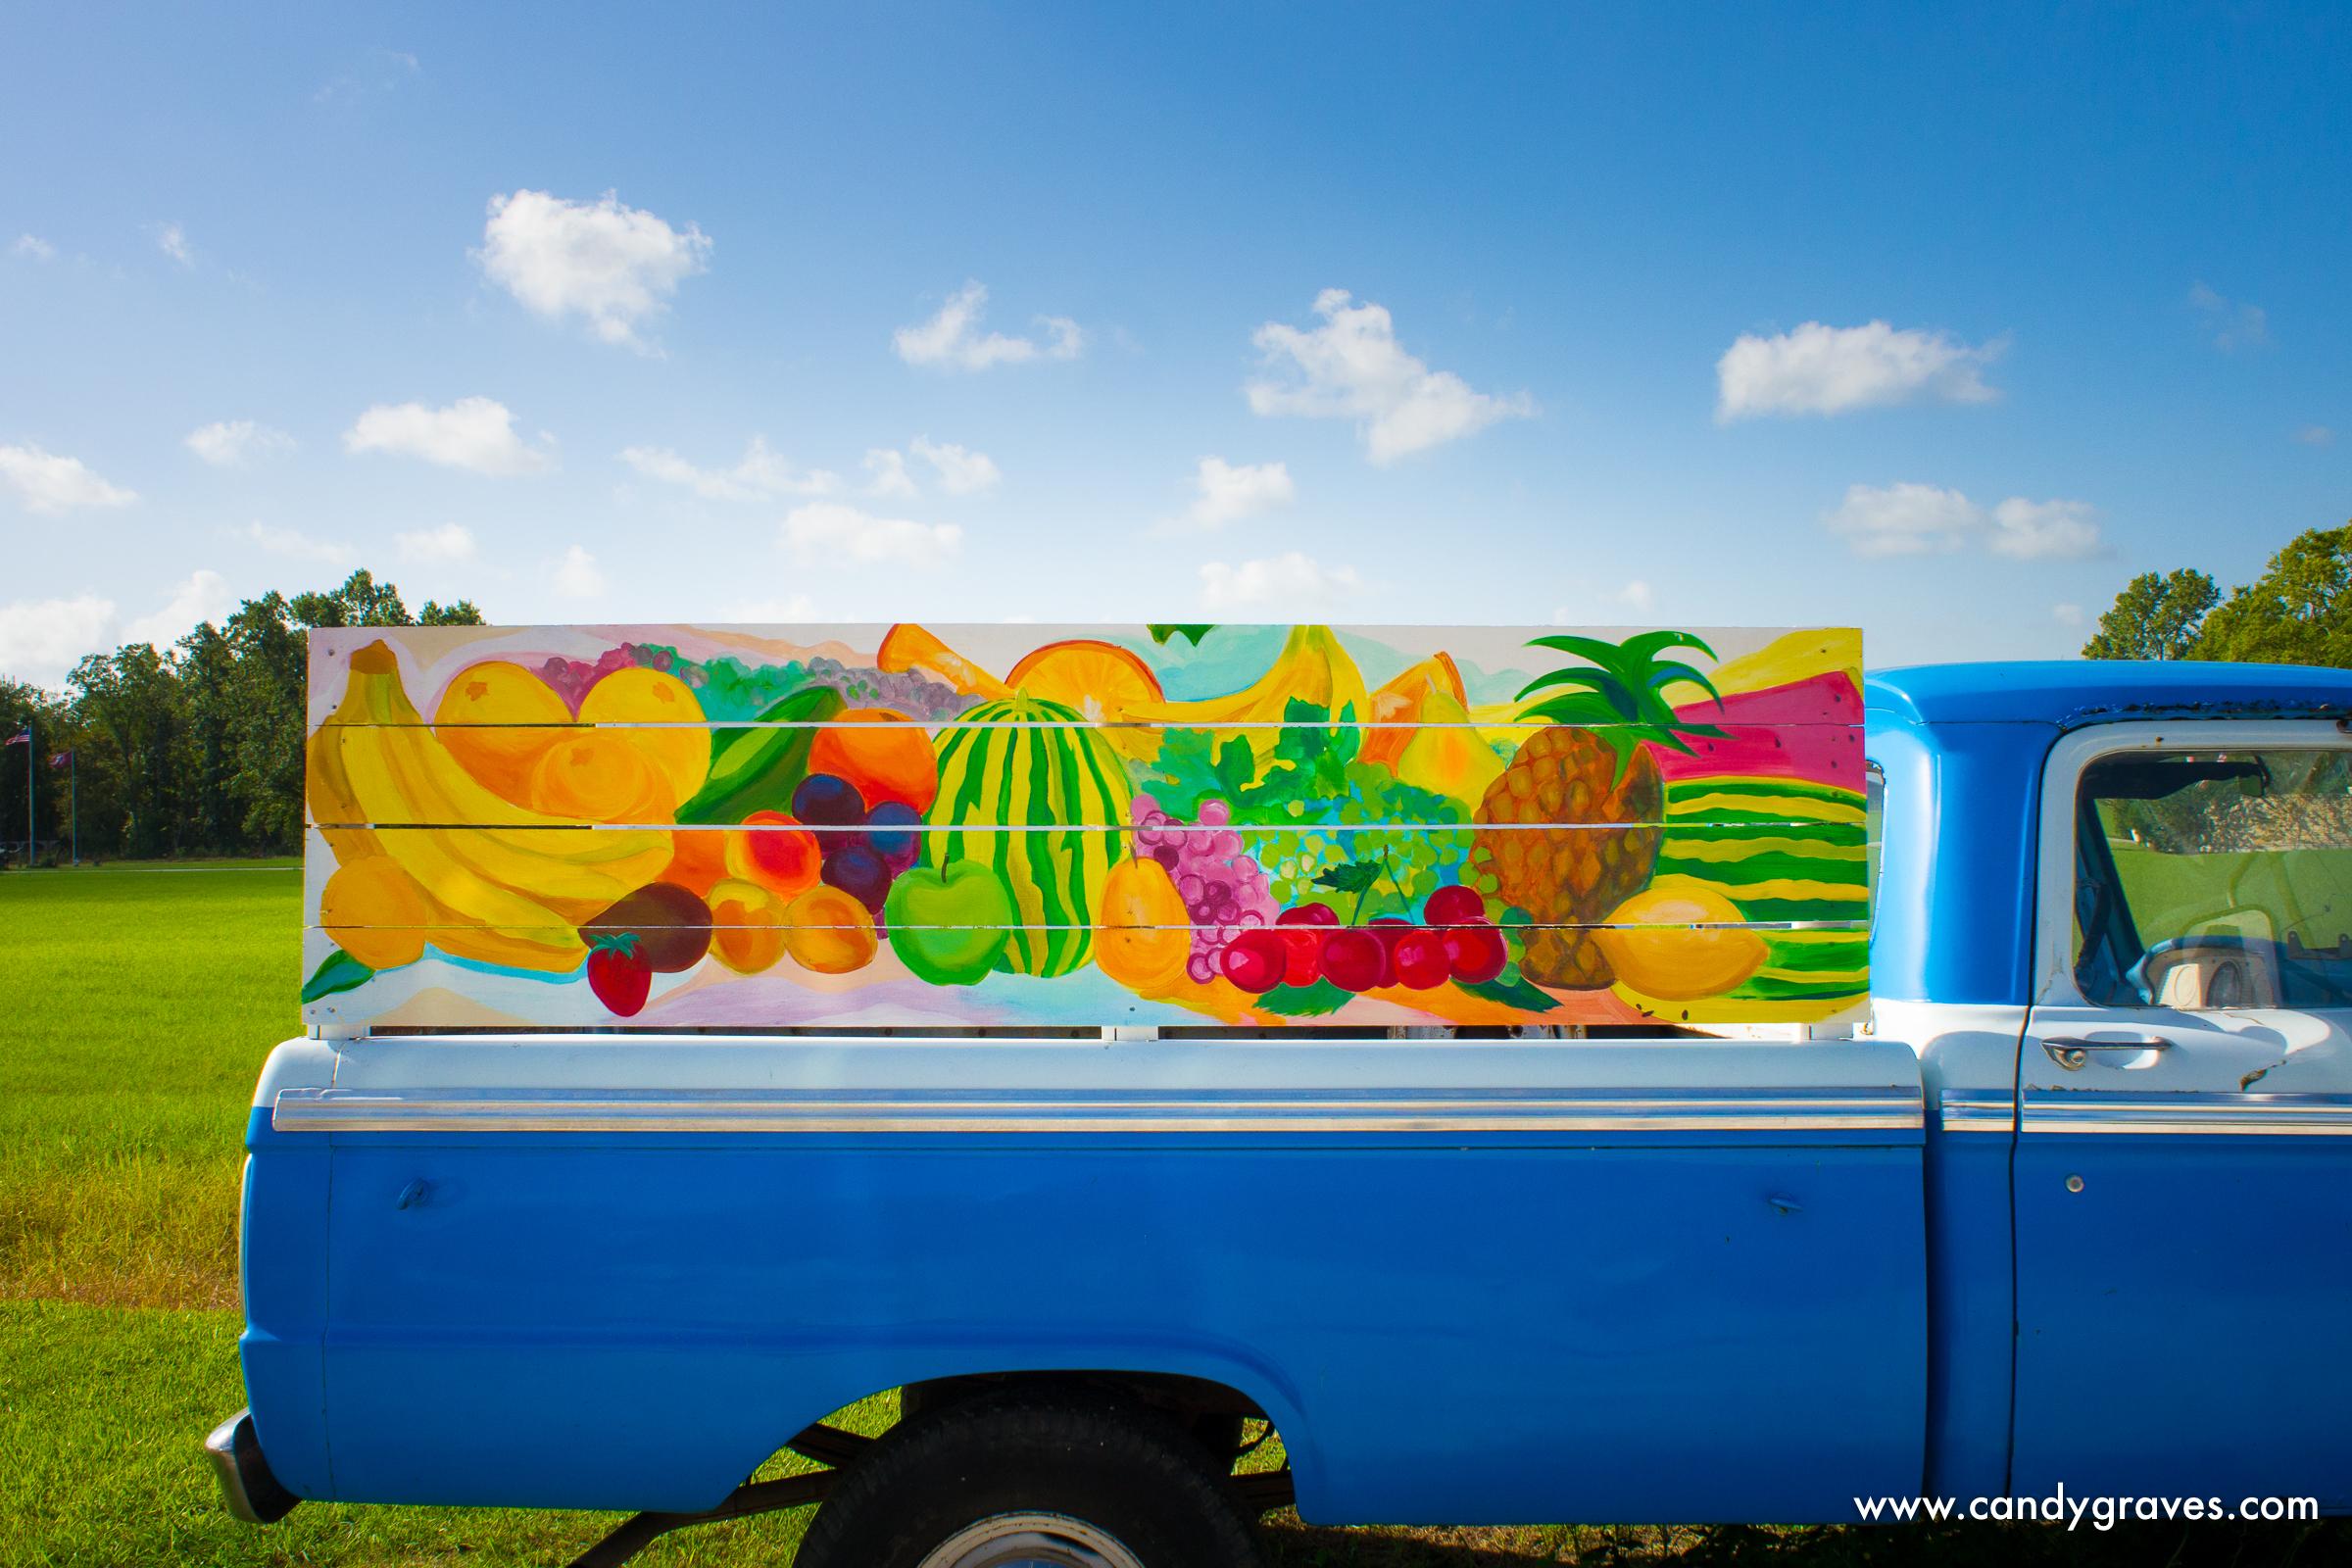 2016-08-06 Art Car Fruits and Veggies 003.jpg